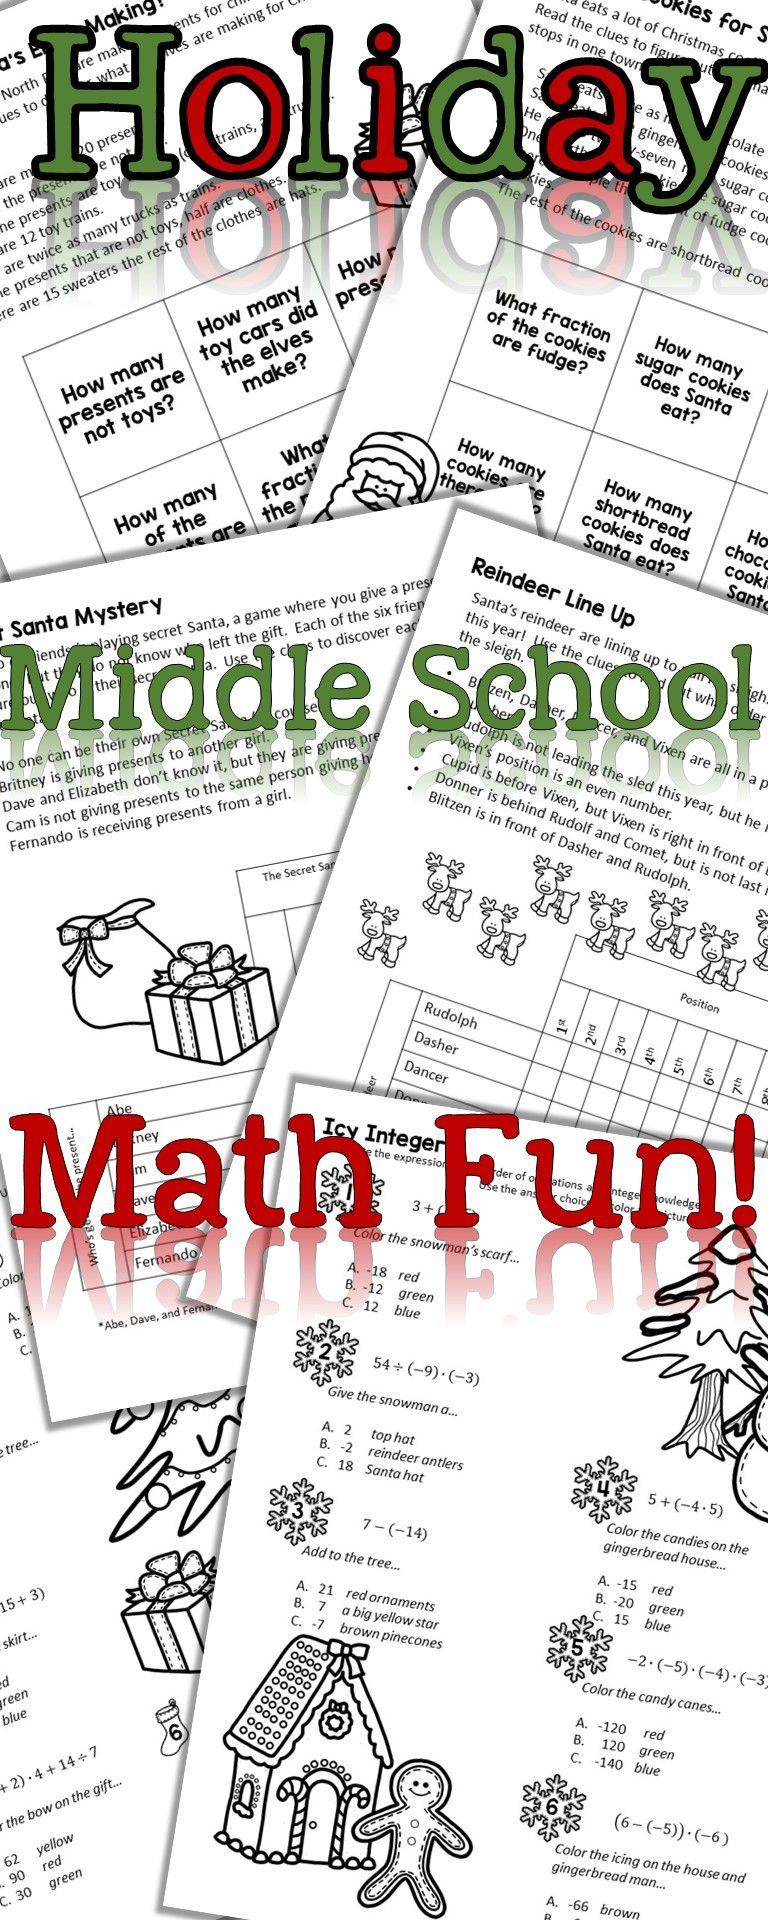 Predownload: Christmas Math Puzzles No Prep Middle School Math Holiday Math Activities Maths Activities Middle School Christmas Math Christmas Math Activities [ 1920 x 768 Pixel ]